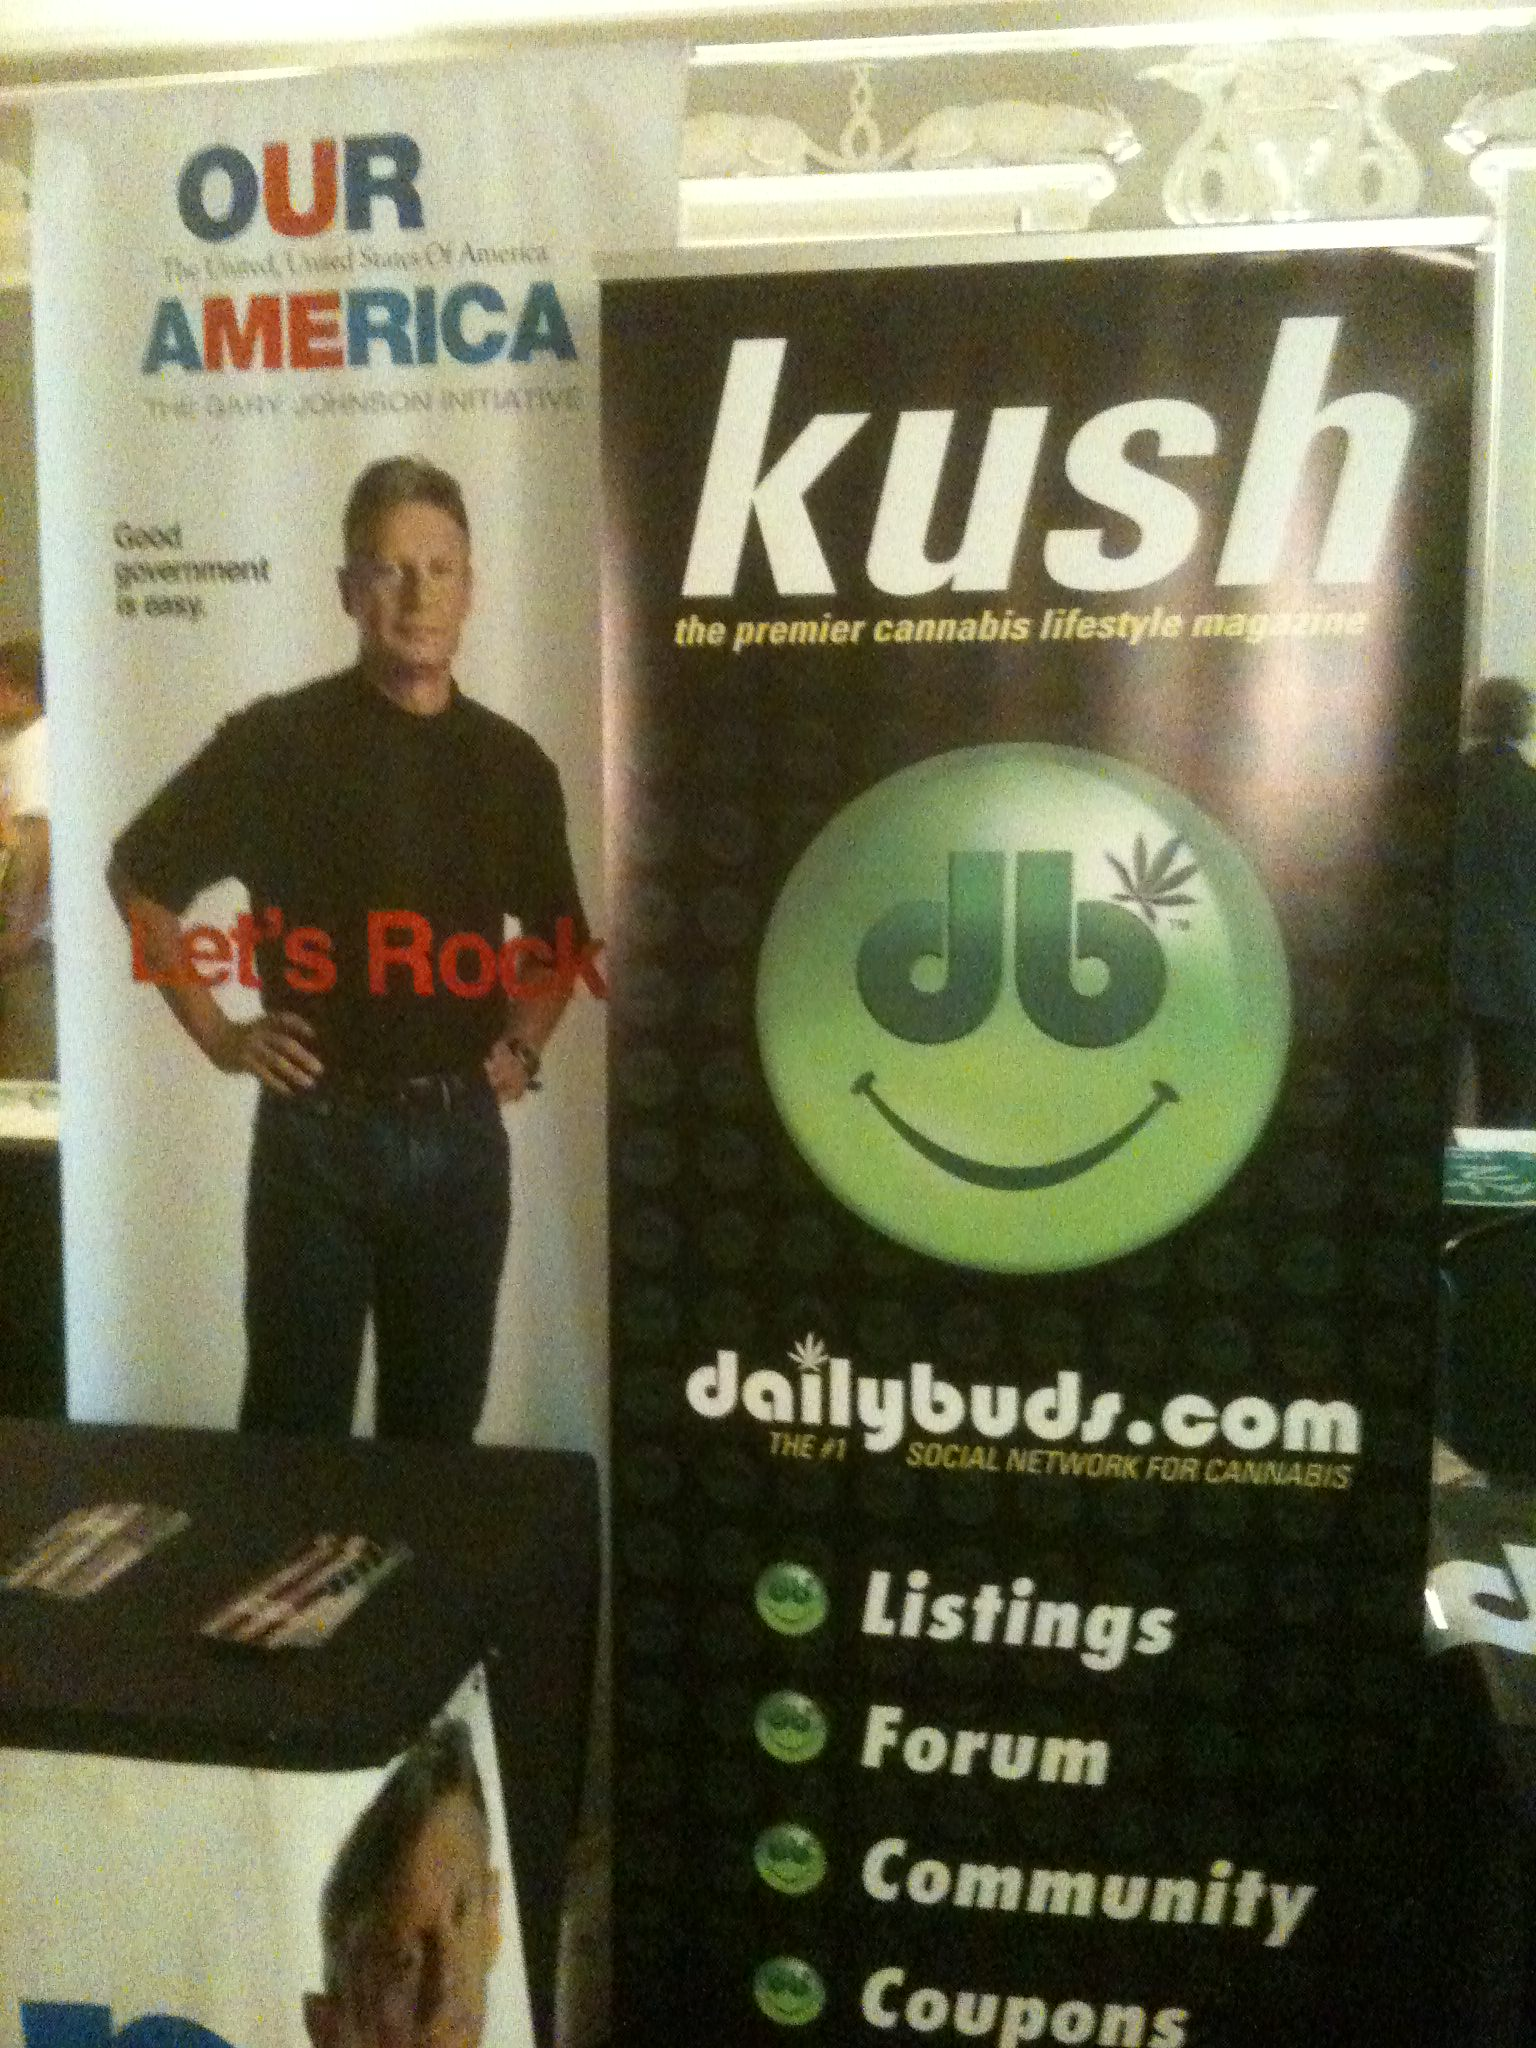 The Kush Kandidate!